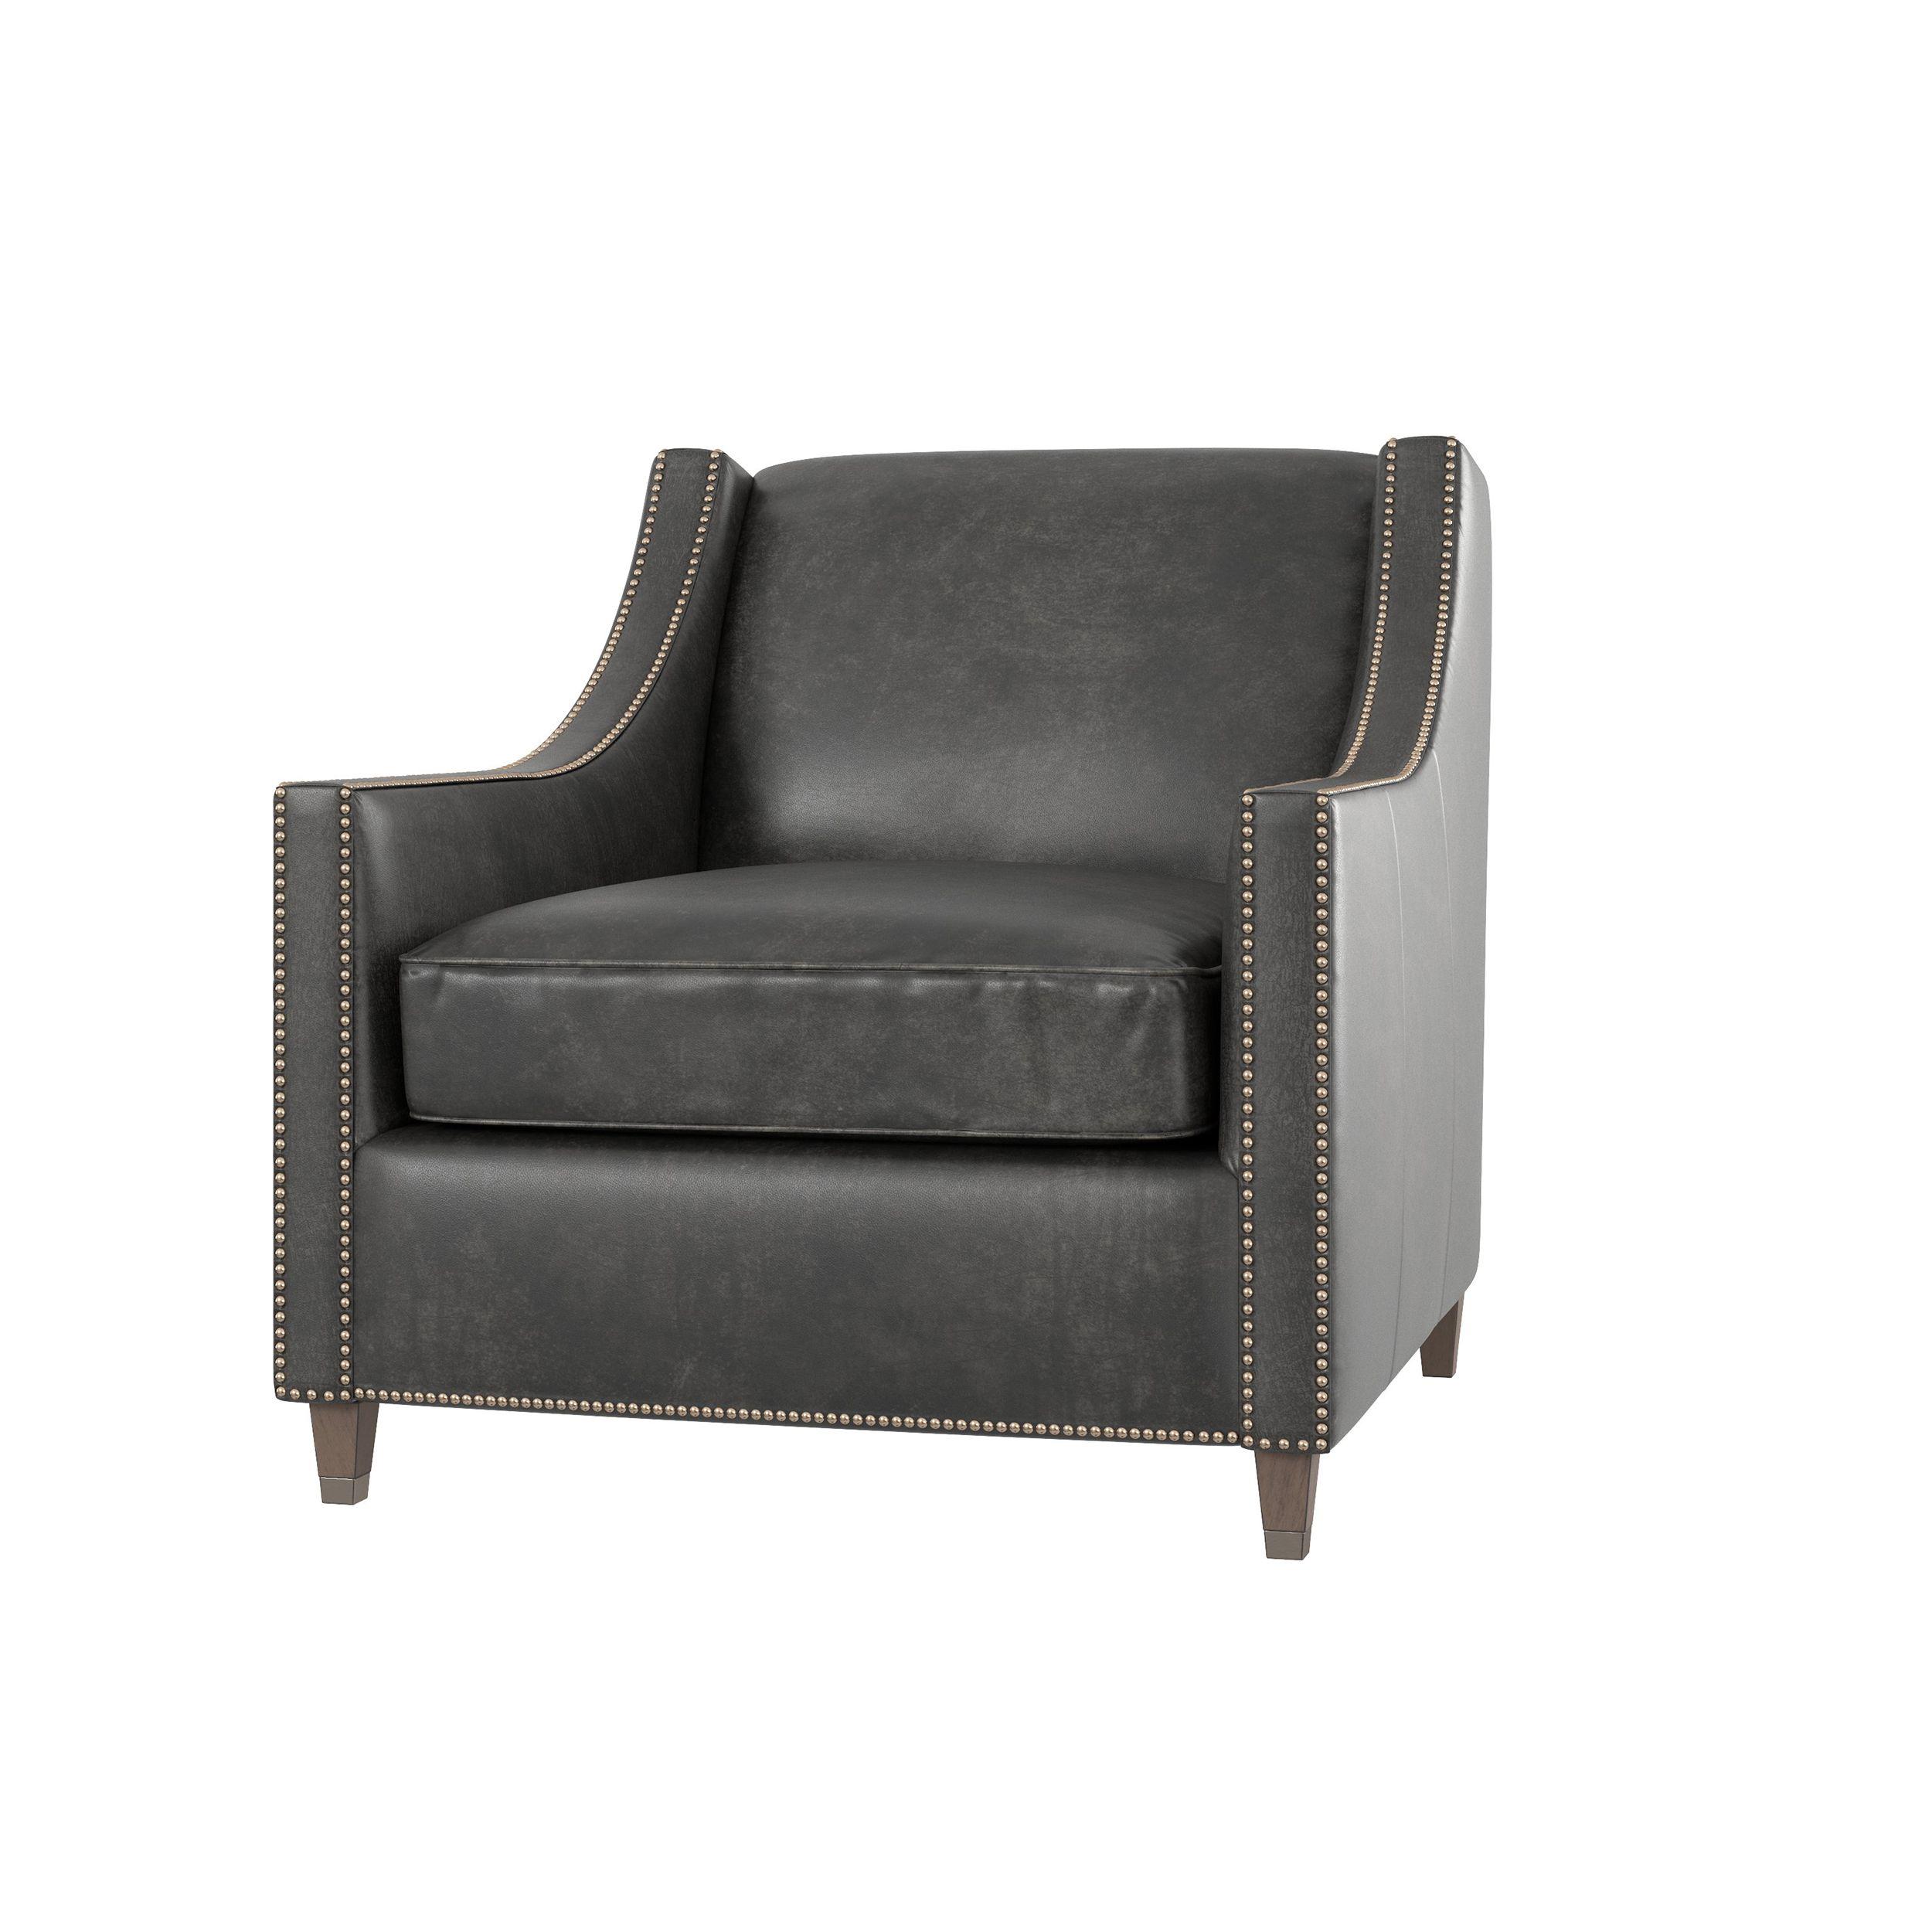 Bernhardt Interiors Palisades Leather Chair Leather Chair Bernhardt Chair